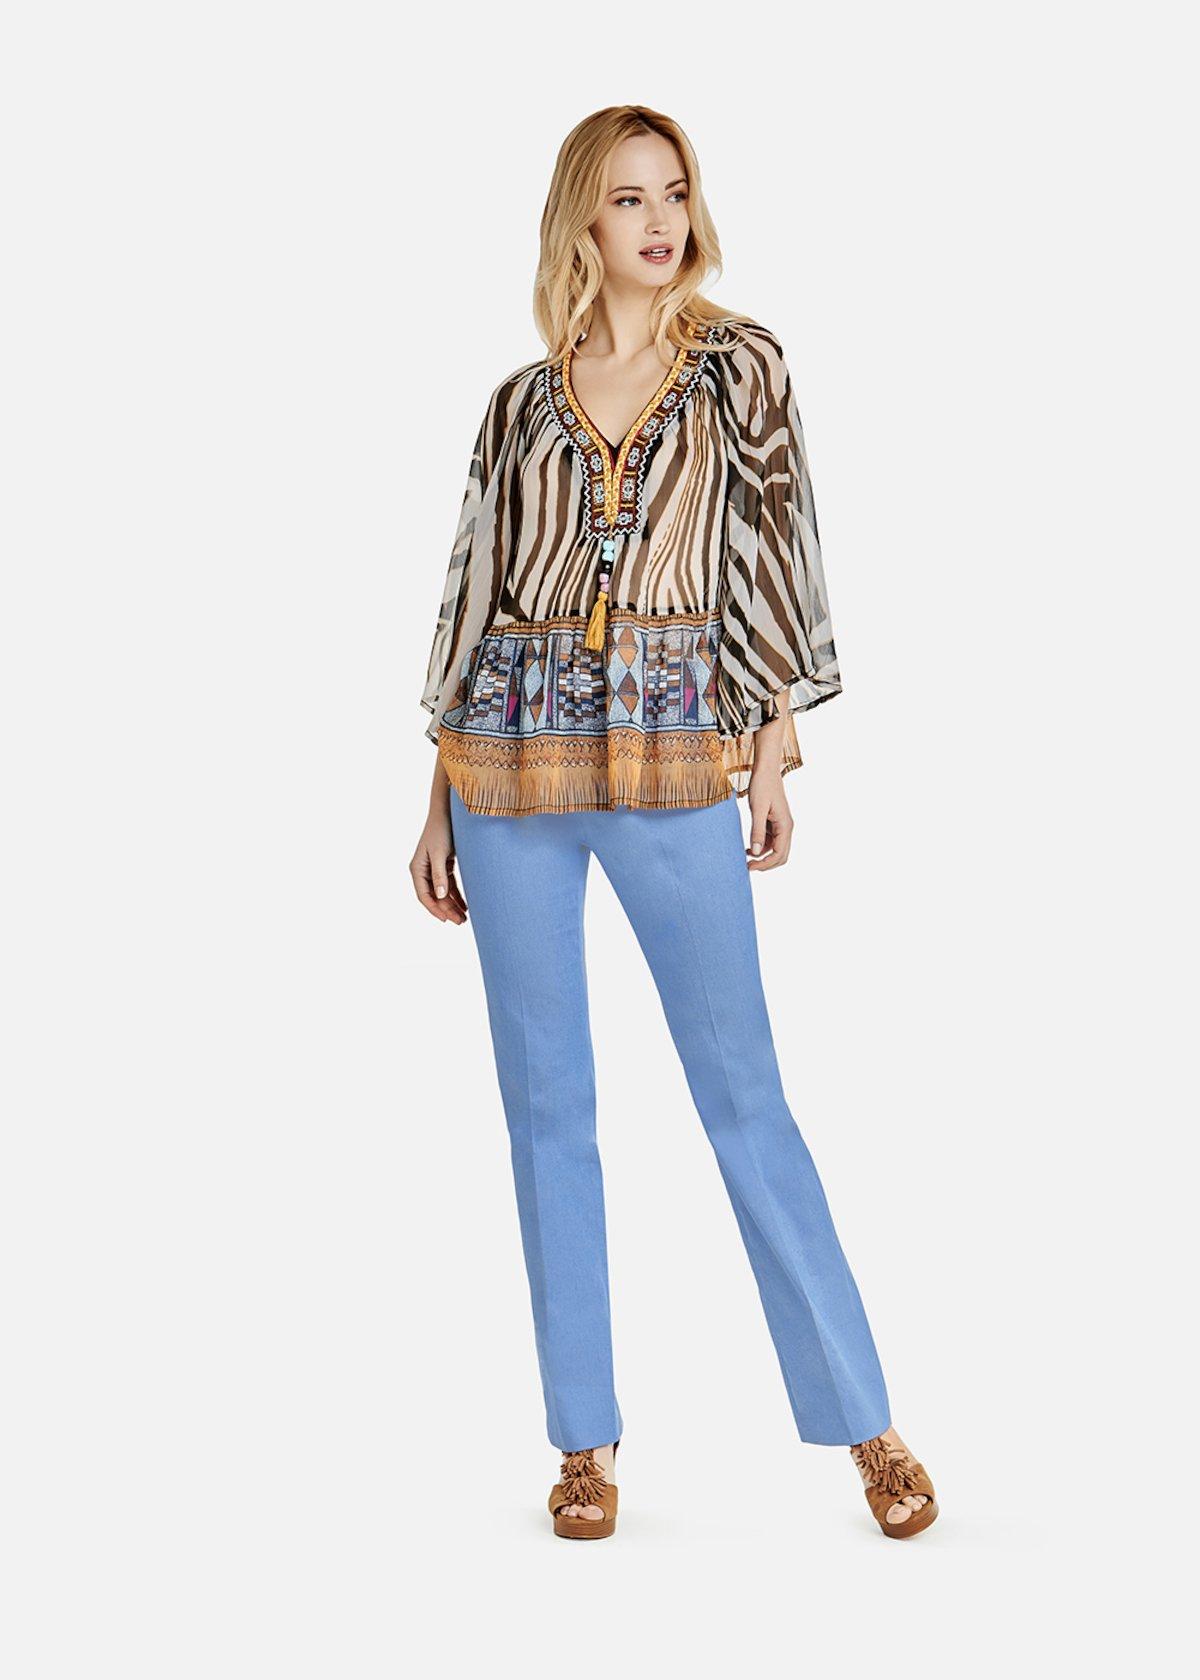 Pantaloni Penny a zampa in chambray chiaro con impunture senape - Denim